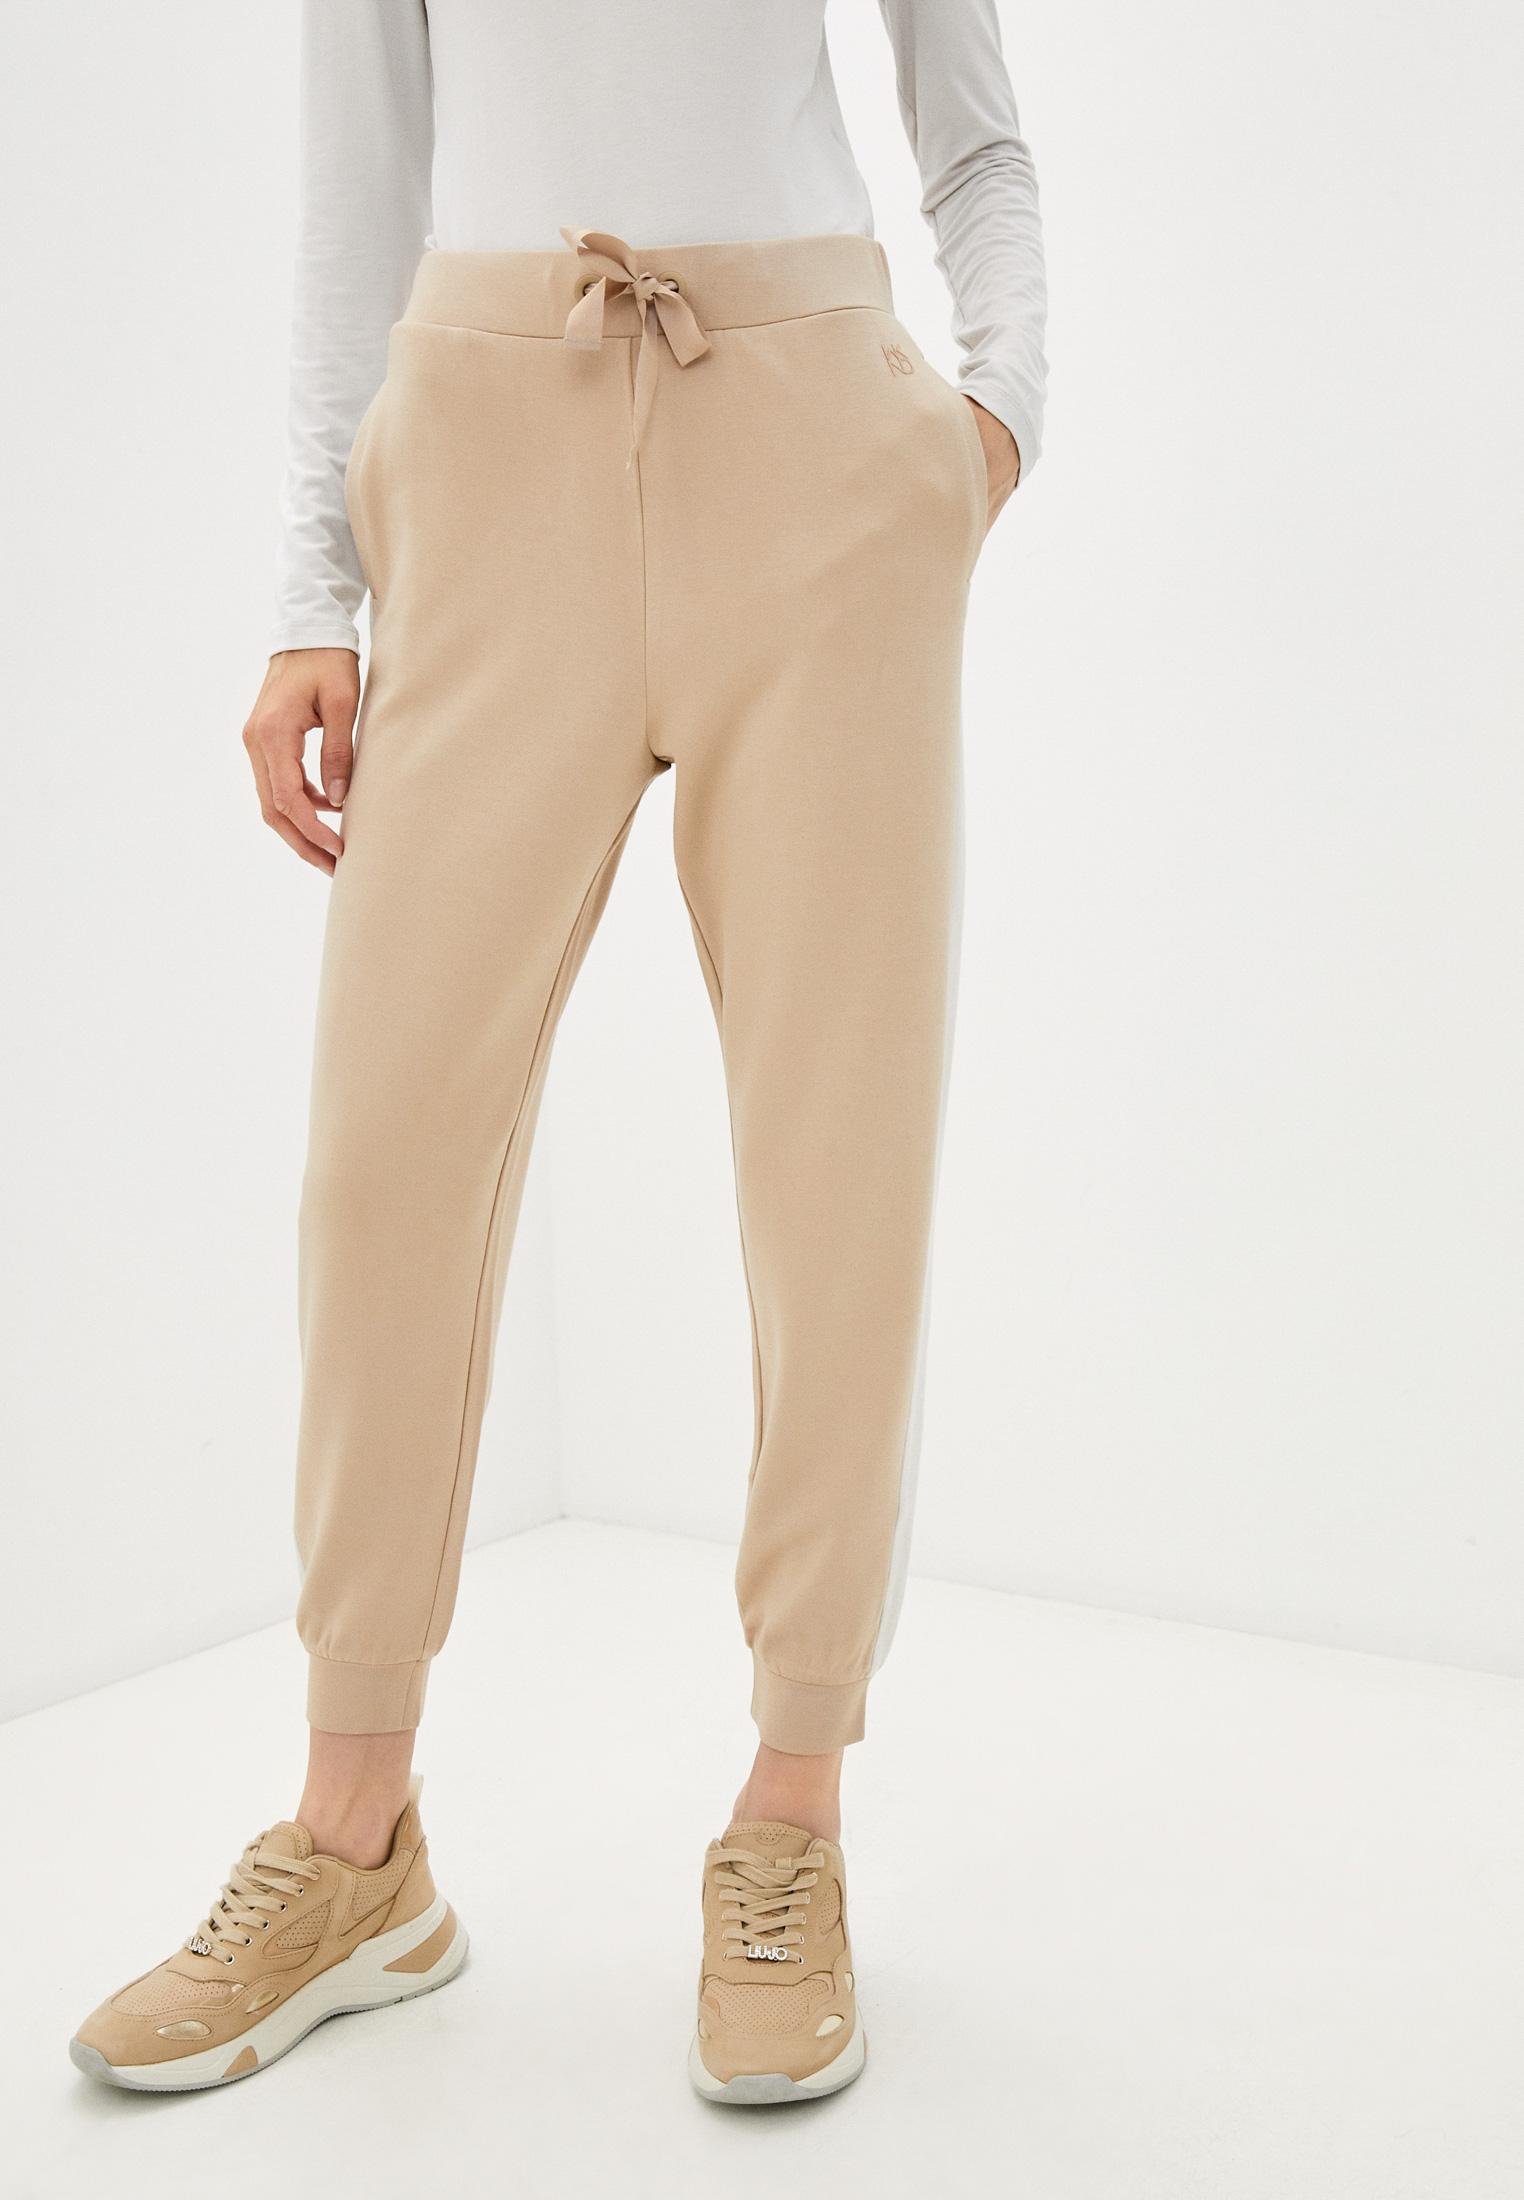 Женские спортивные брюки Weekend Max Mara (Уикенд Макс Мара) 57860319